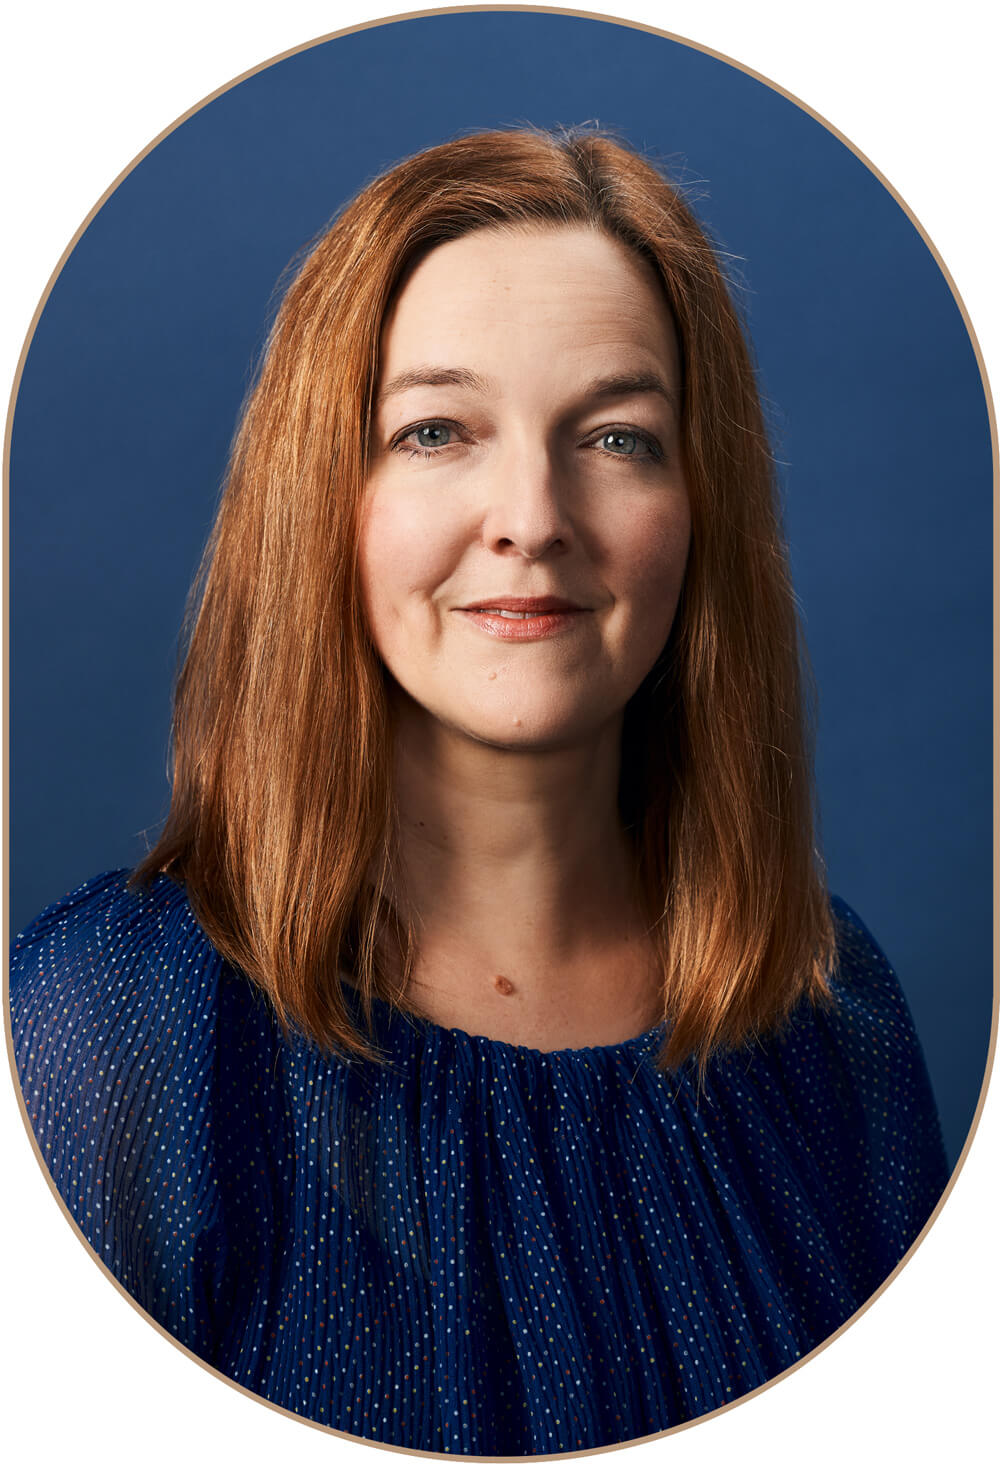 Annabel Markham